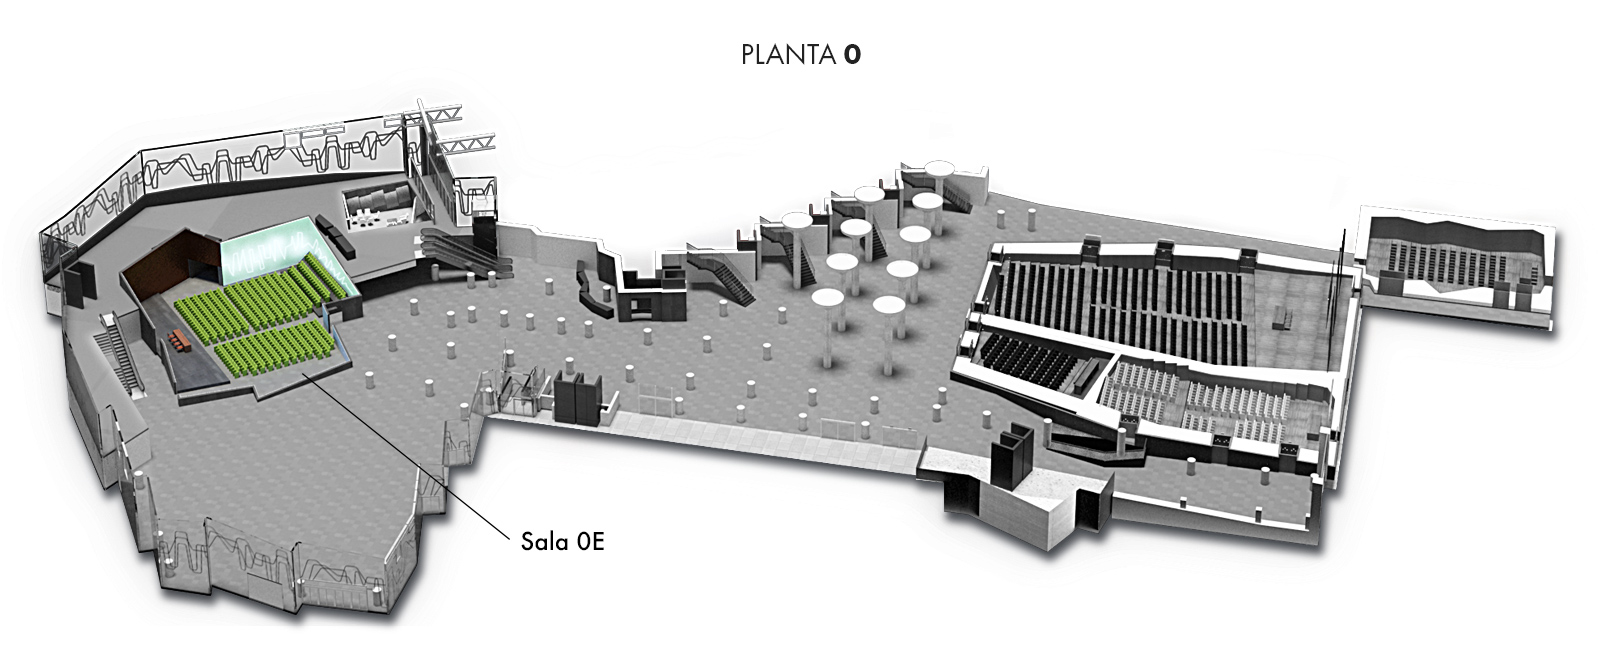 Sala 0E, Planta 0 | Palacio Euskalduna Jauregia